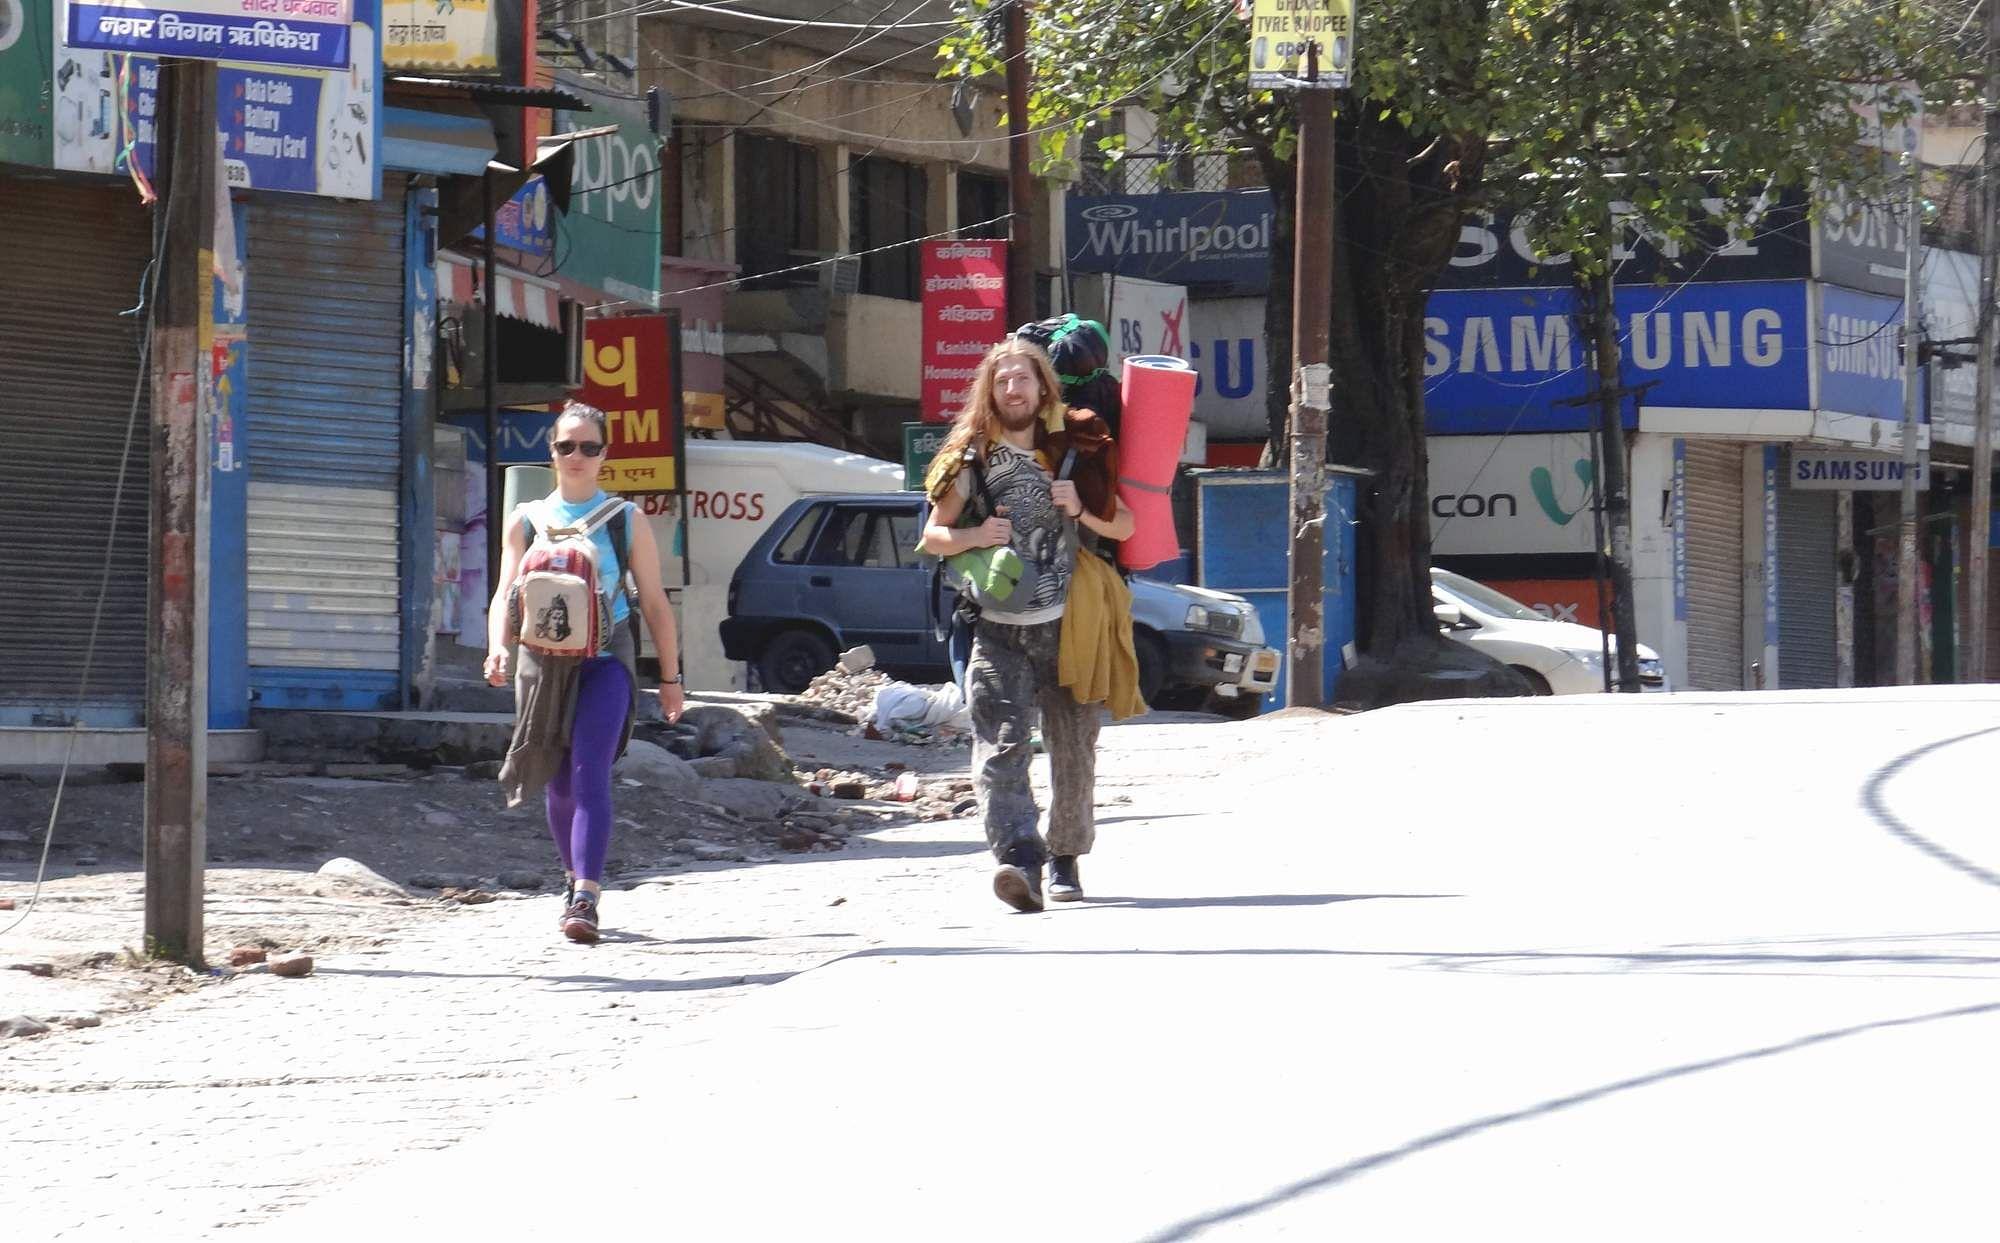 हरिद्वार मार्ग पर गुजरता विदेशी नागरिकों का जोड़ा।